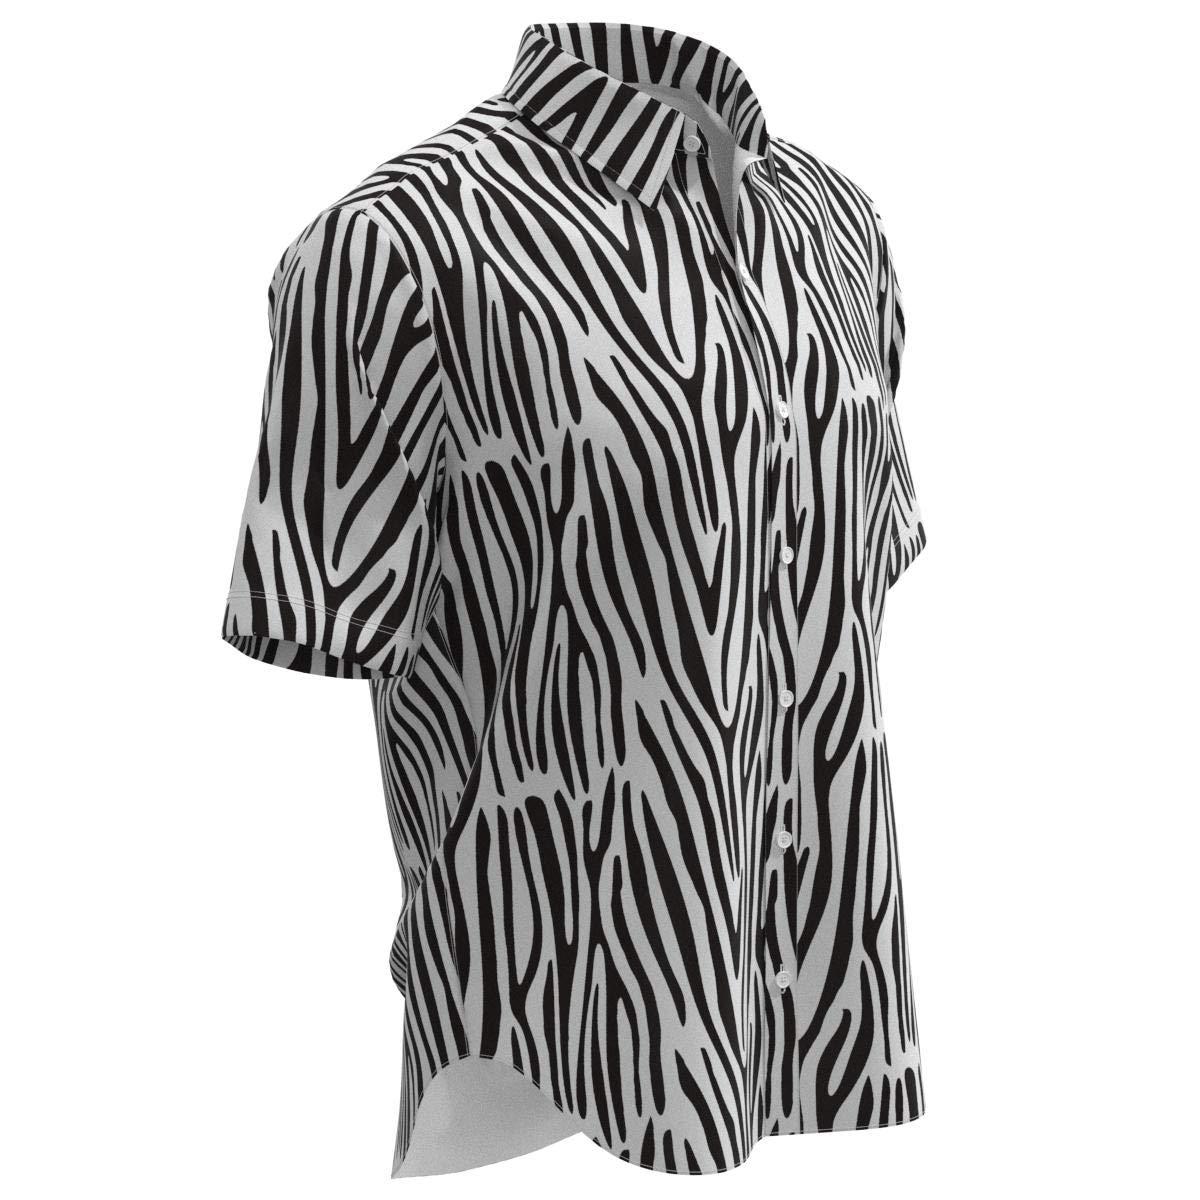 EightyThree XYZ Black White Zebra Stripes Print Men Short Sleeve Button Shirt Size XS-3XL